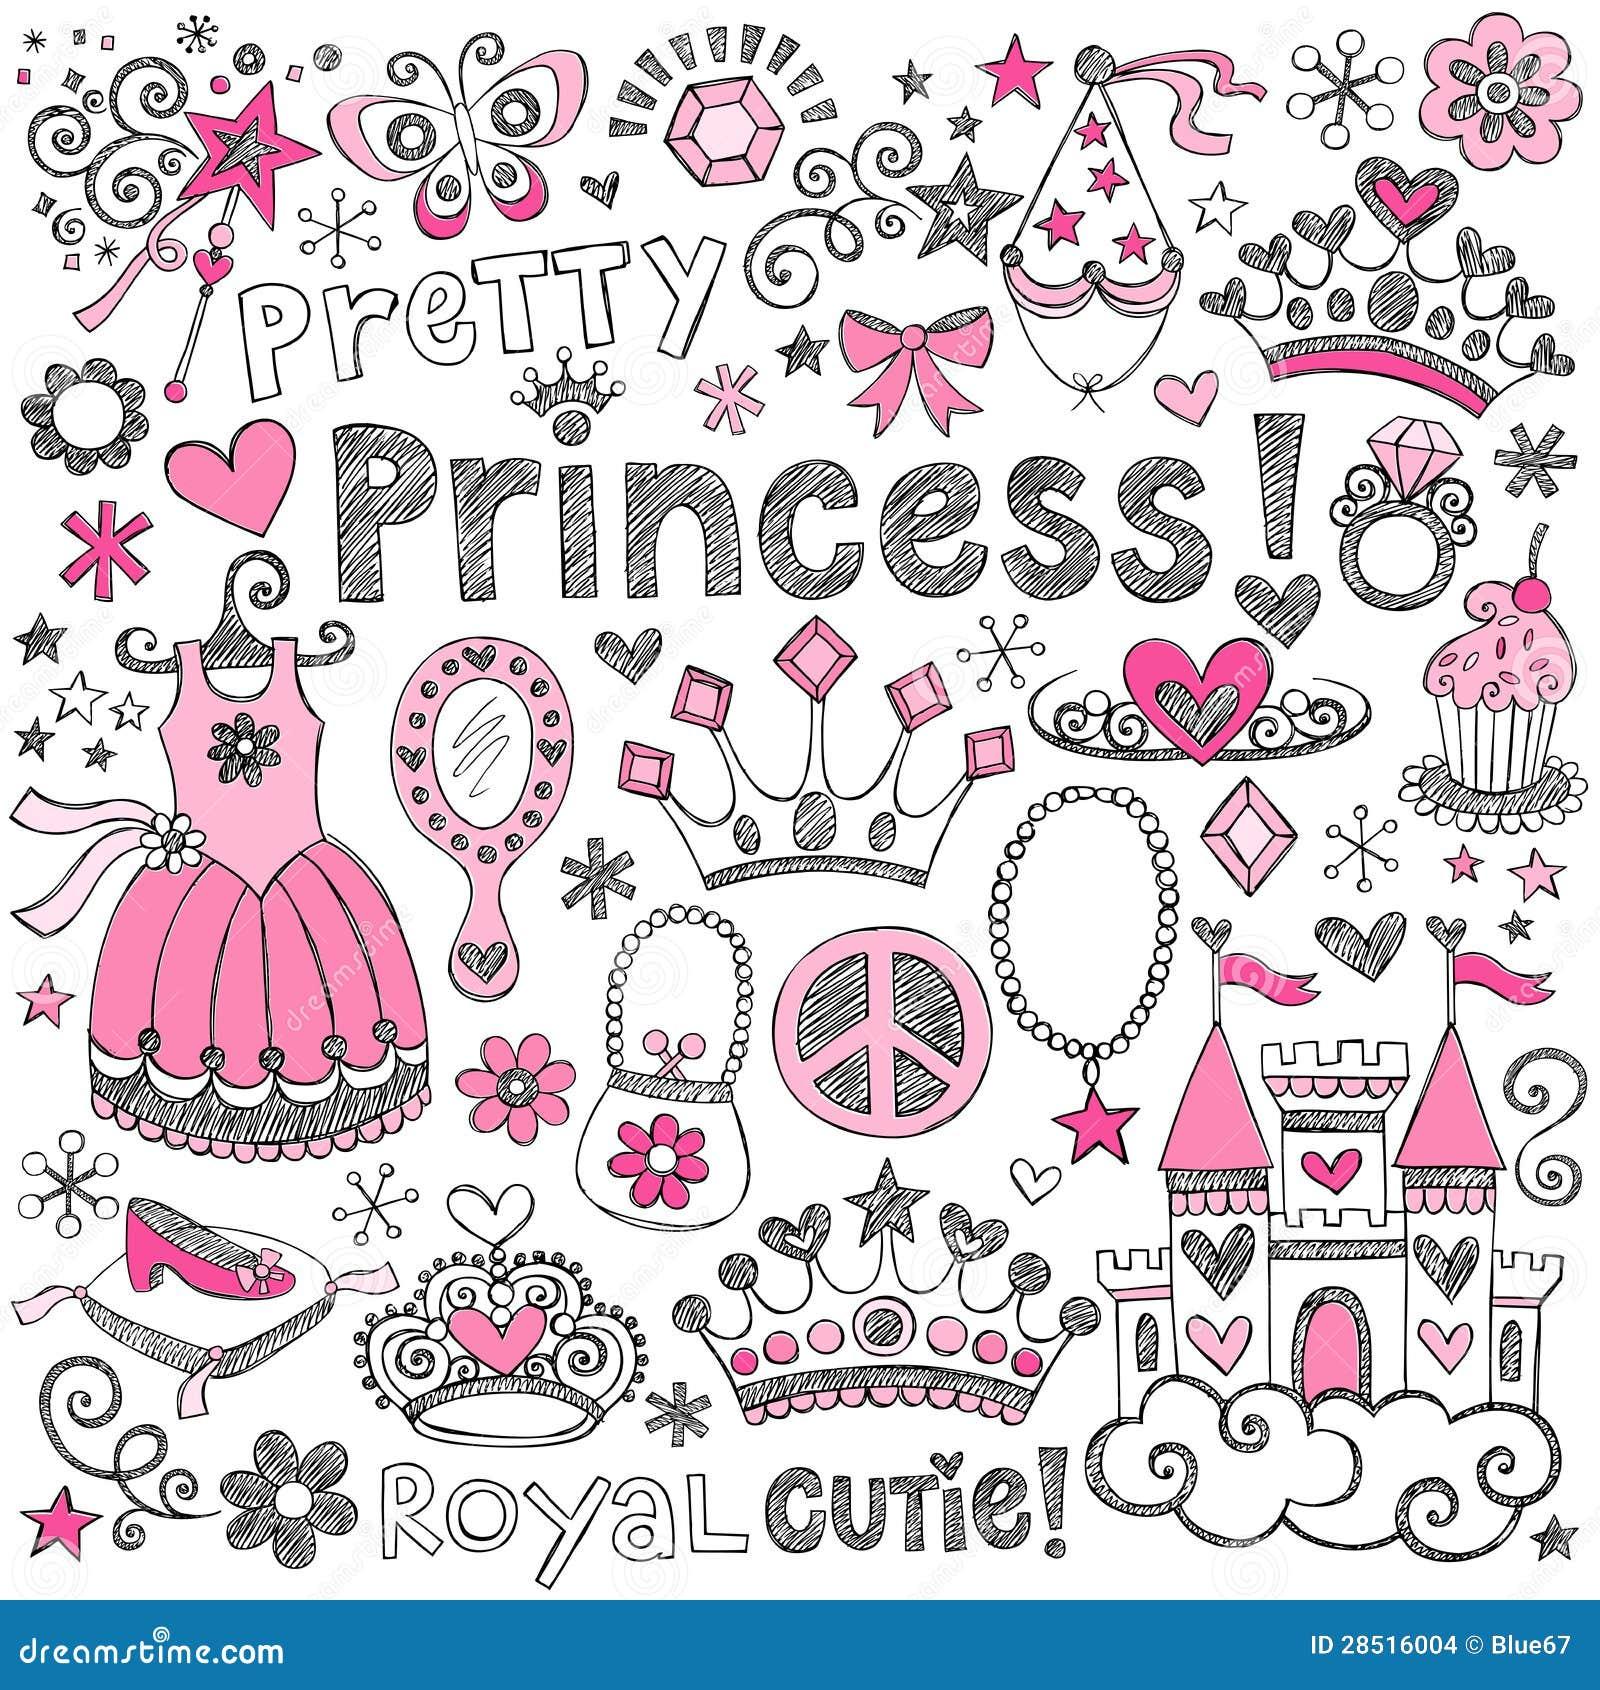 Princess Tiara Royalty Sketchy Doodles Vector Set Stock Images - Image ...